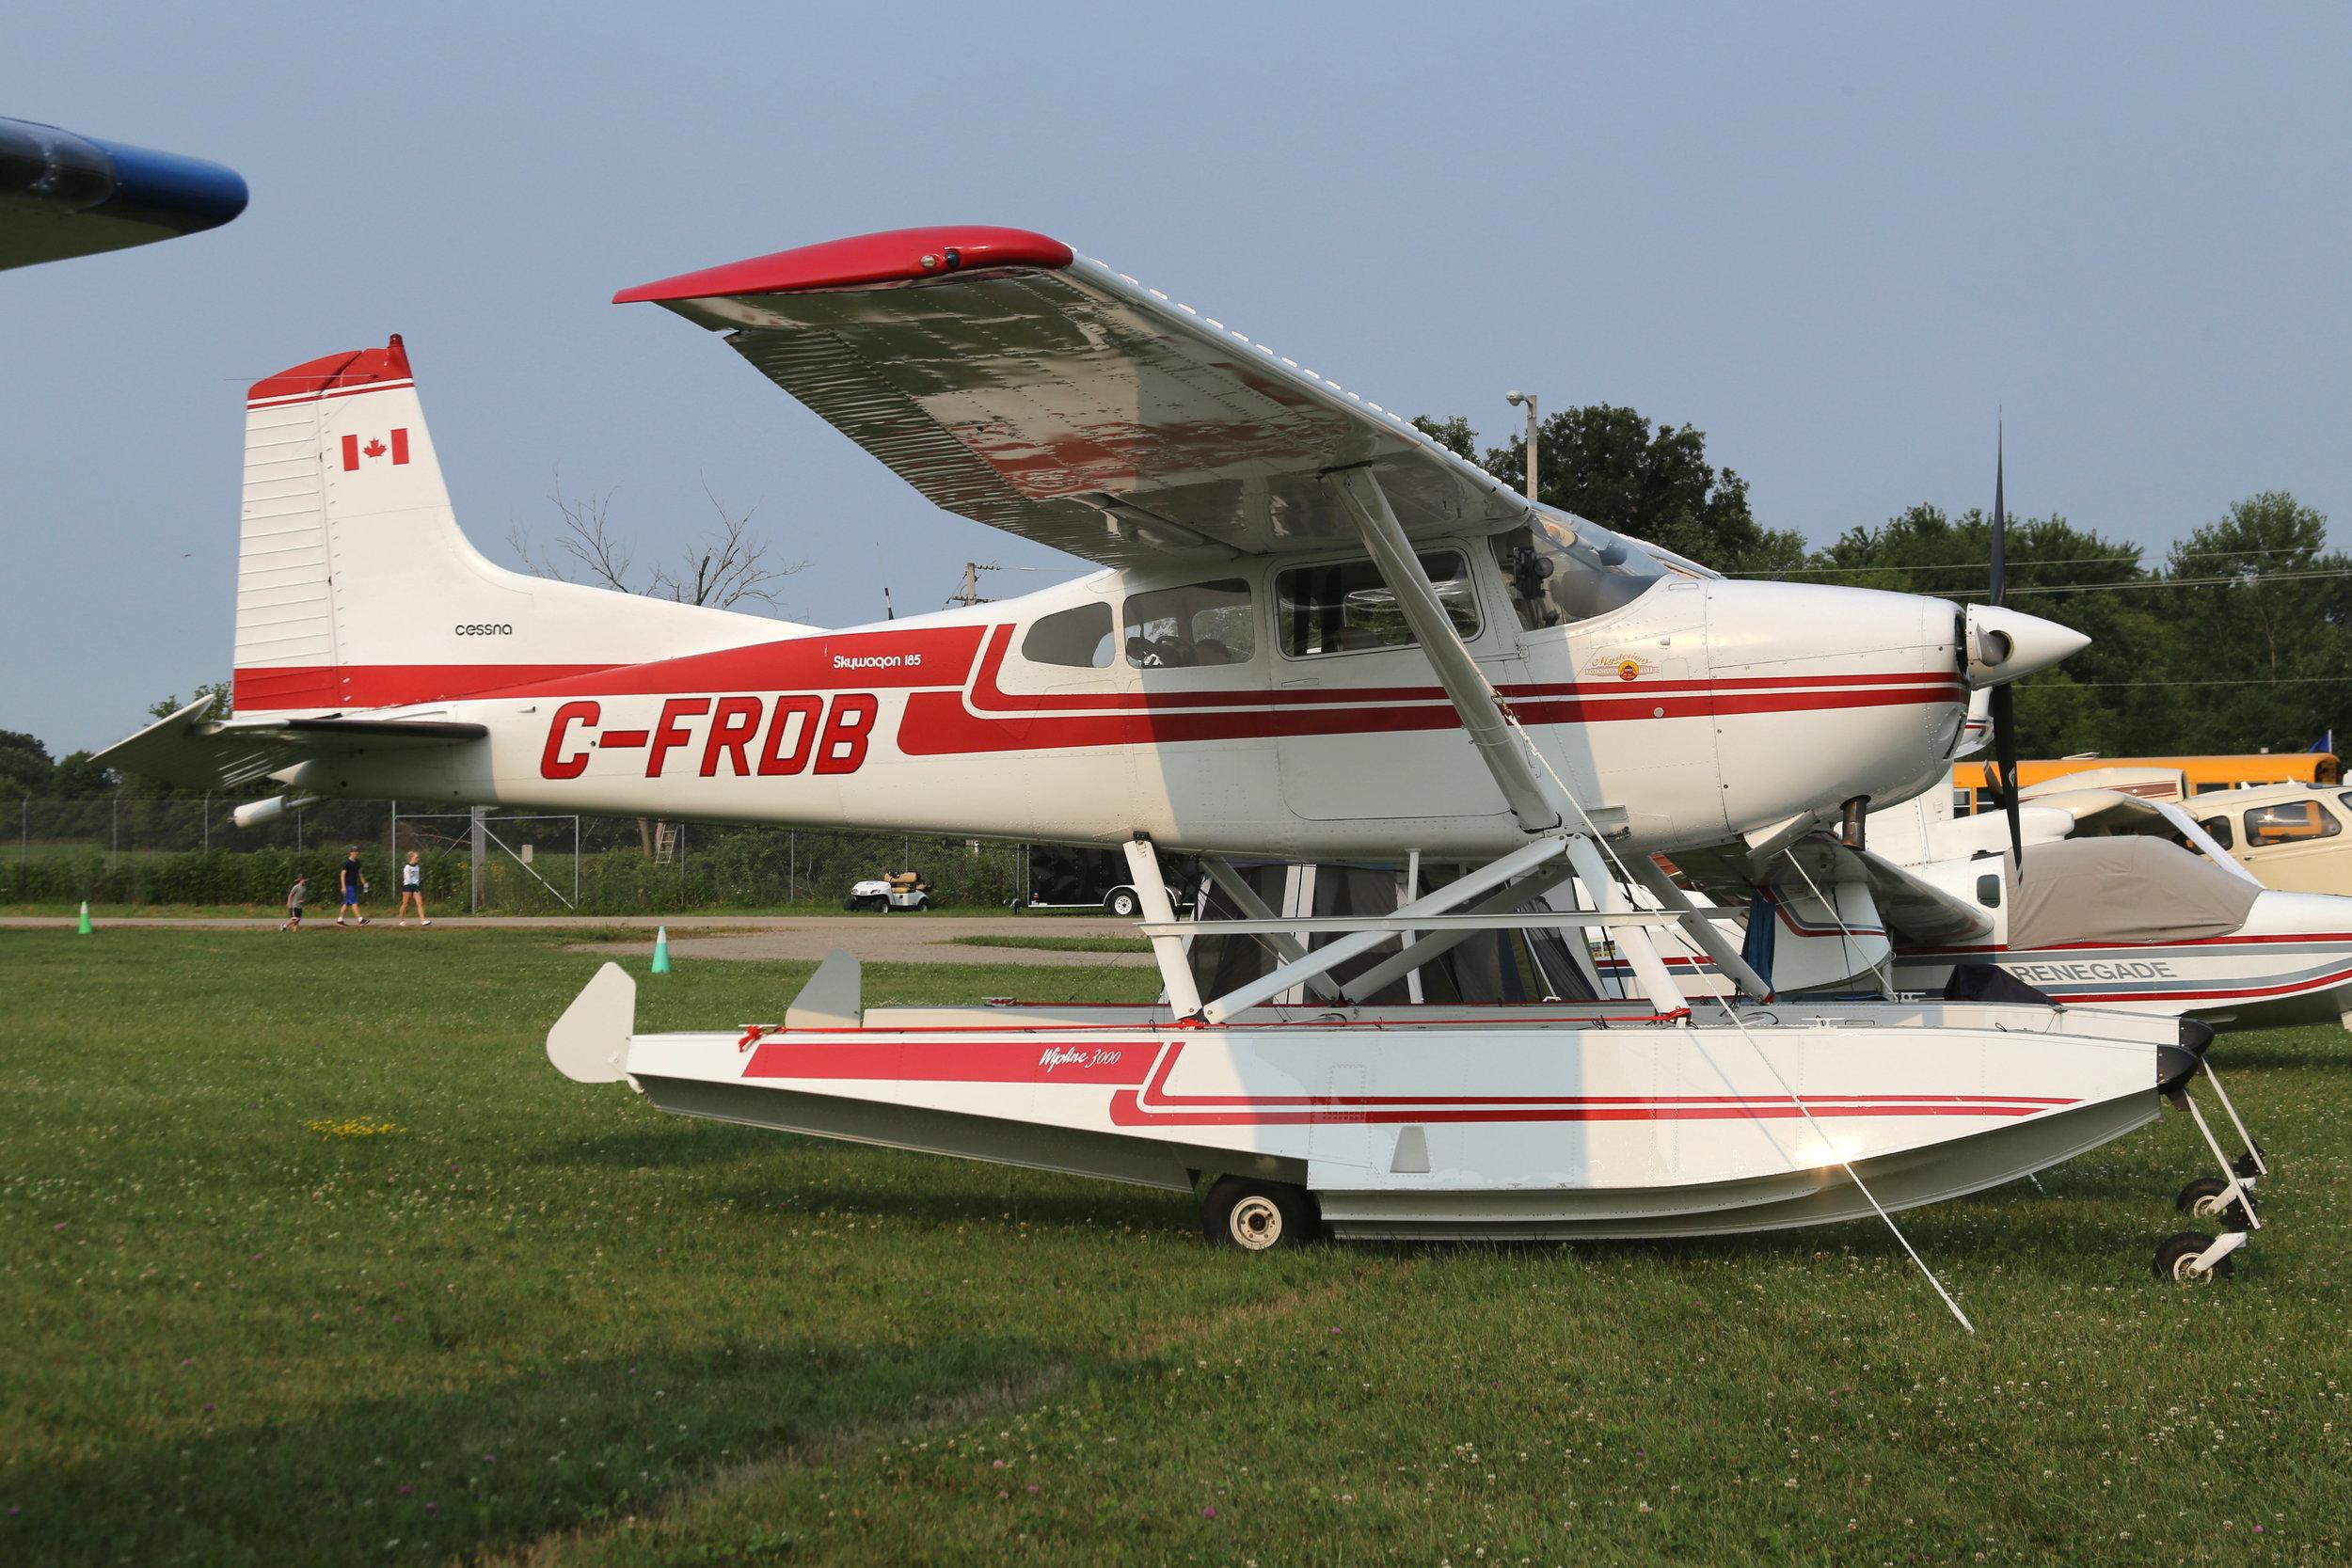 C-FRDB Cessna 185 Skywagon taken at Oshkosh 23rd July 2018 by John Wood